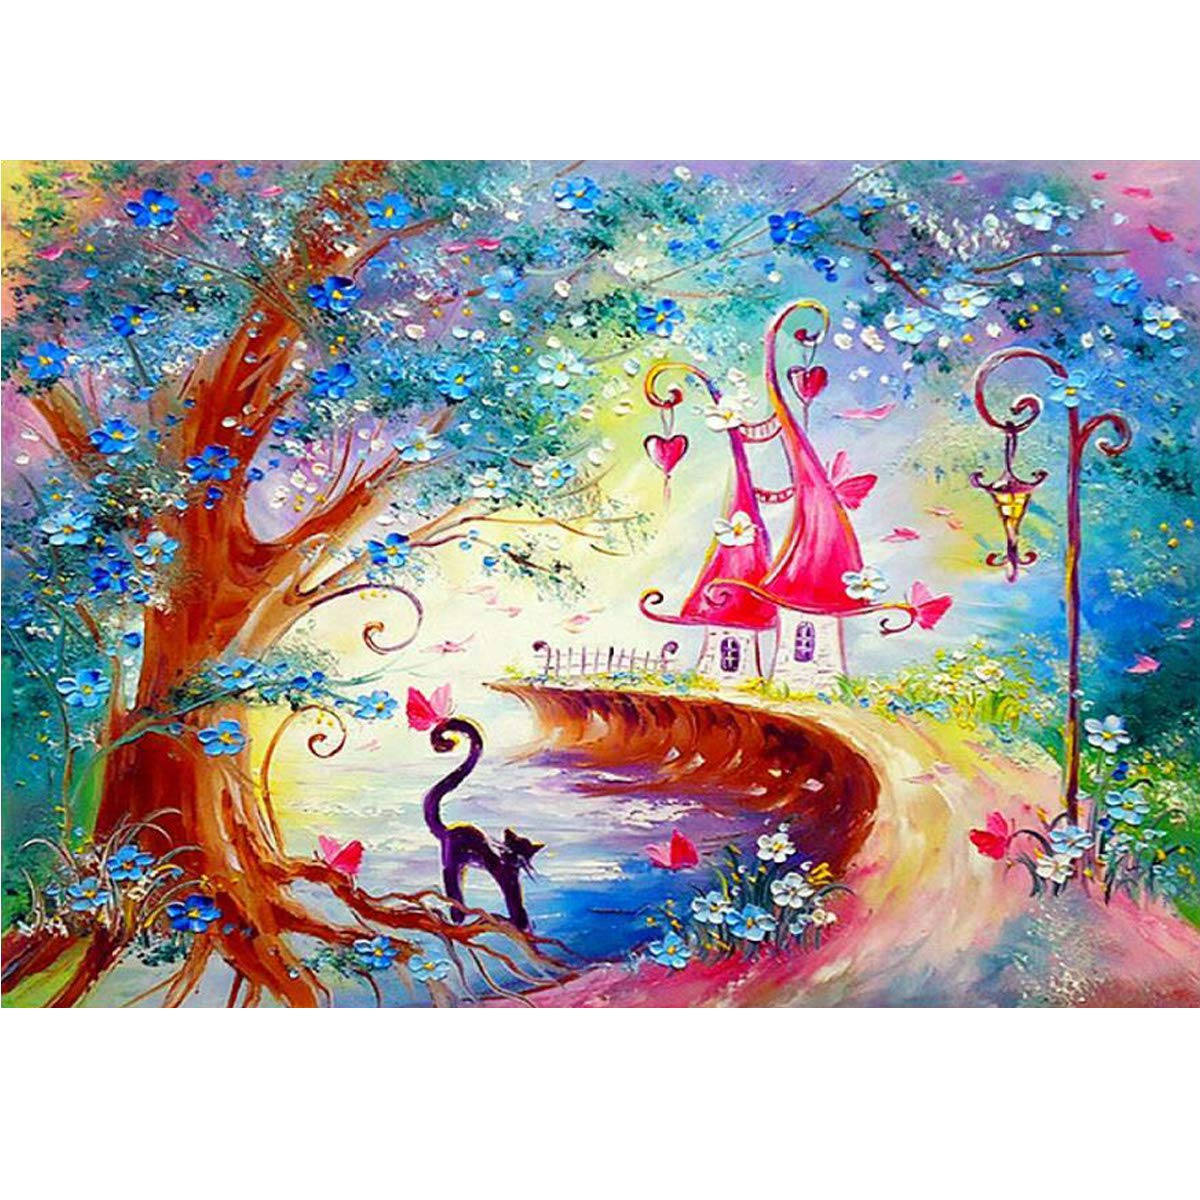 Fairy-tale Horses; Beads embroidery kit; contemporary embroidery; gift idea; needlepoint design; decor; seed beads Preciosa;